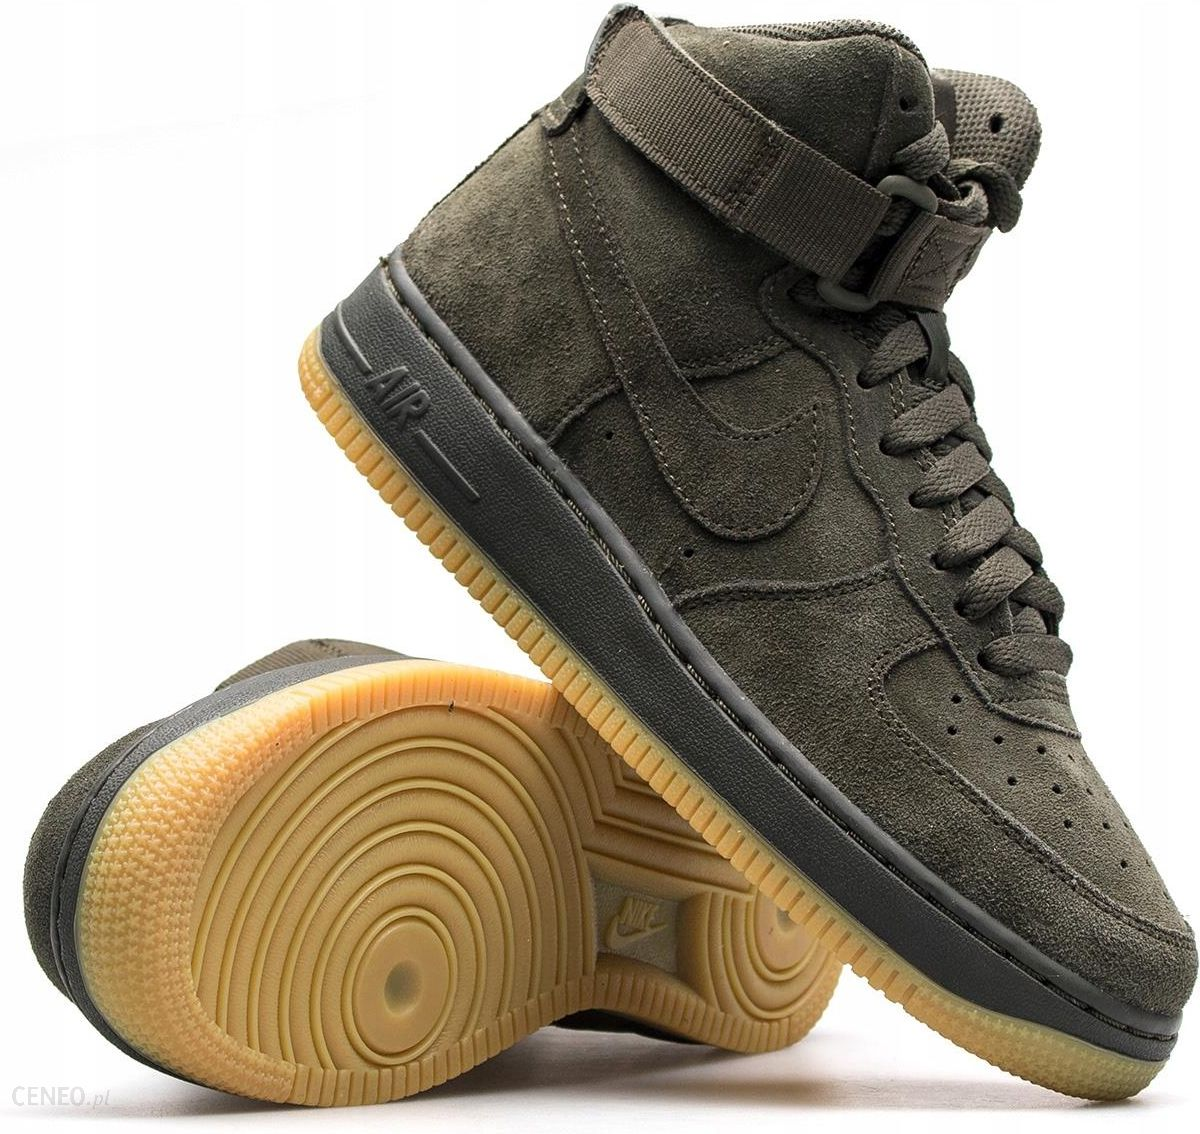 Nike Buty dziecięce Air Force 1 High Lv8 Gs zielone r. 38 (807617 300)